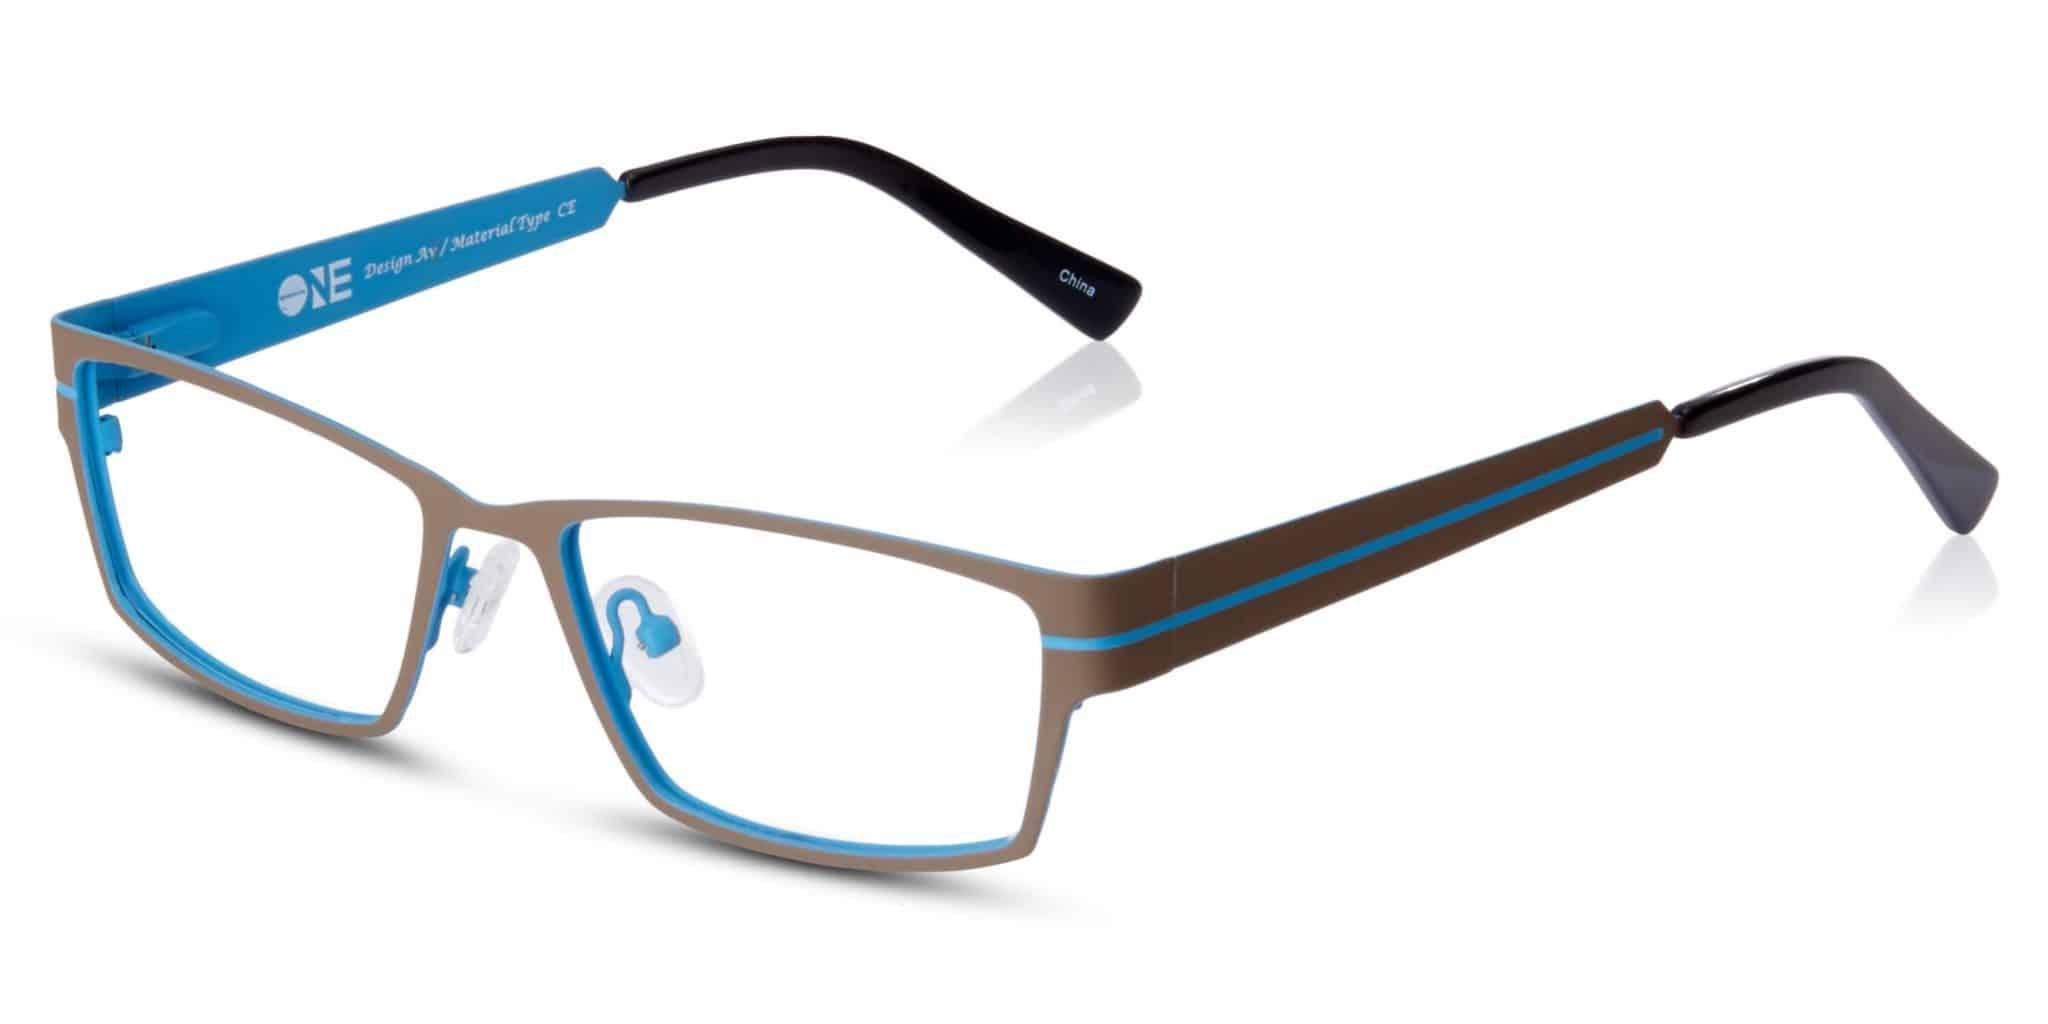 ONE - מתכת כחול כהה עם צבע פנימי